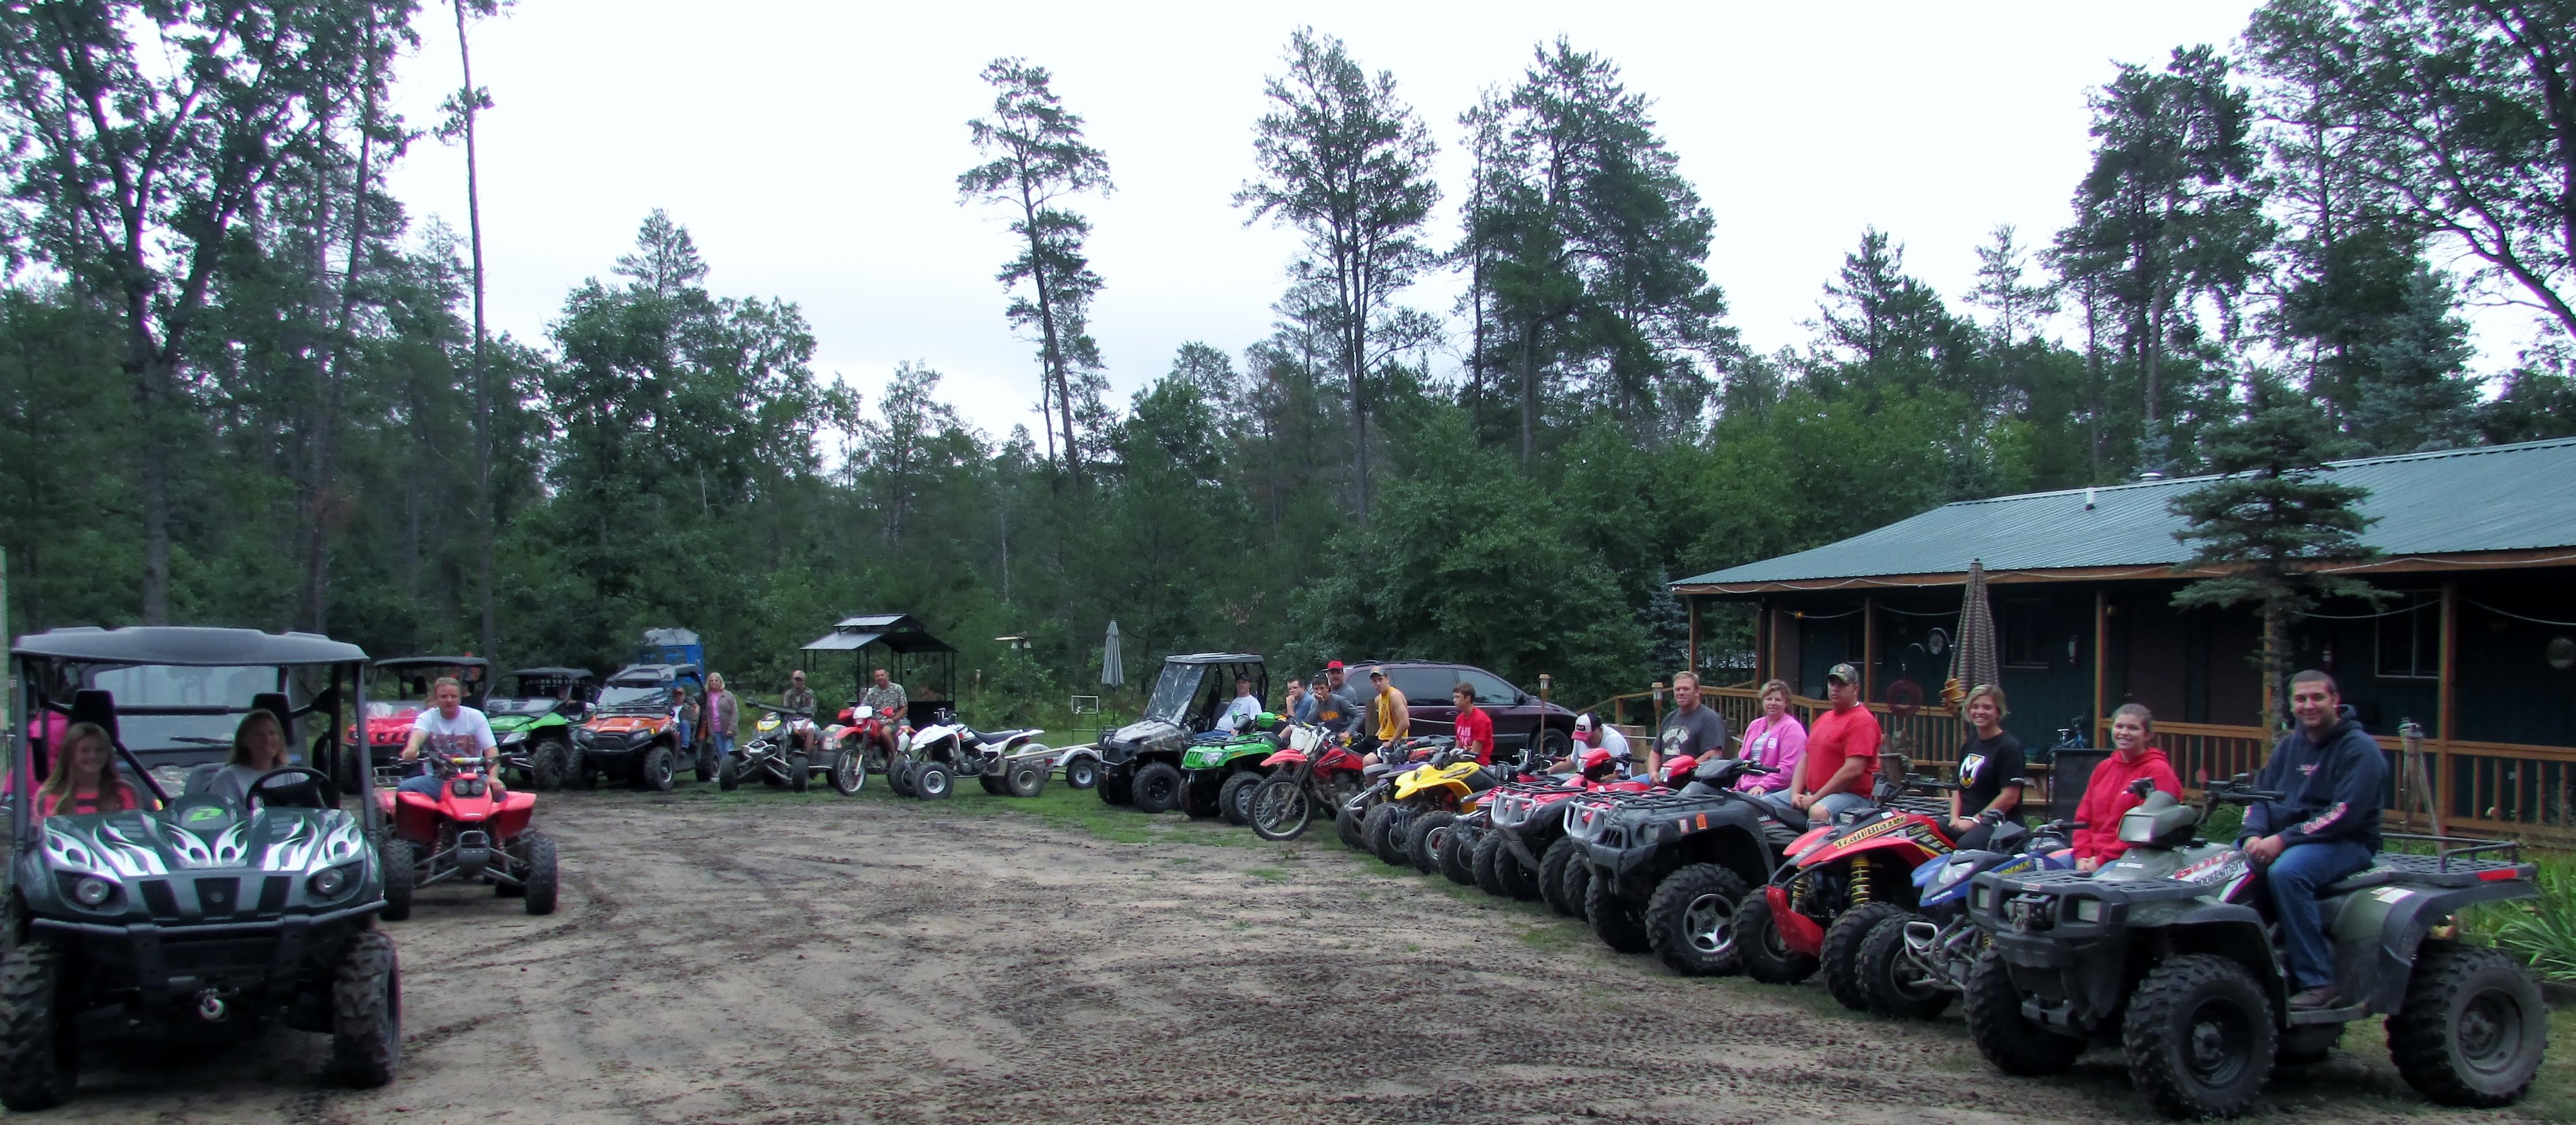 Best Bear Lodge & Campground Baldwin/Irons Area image 9